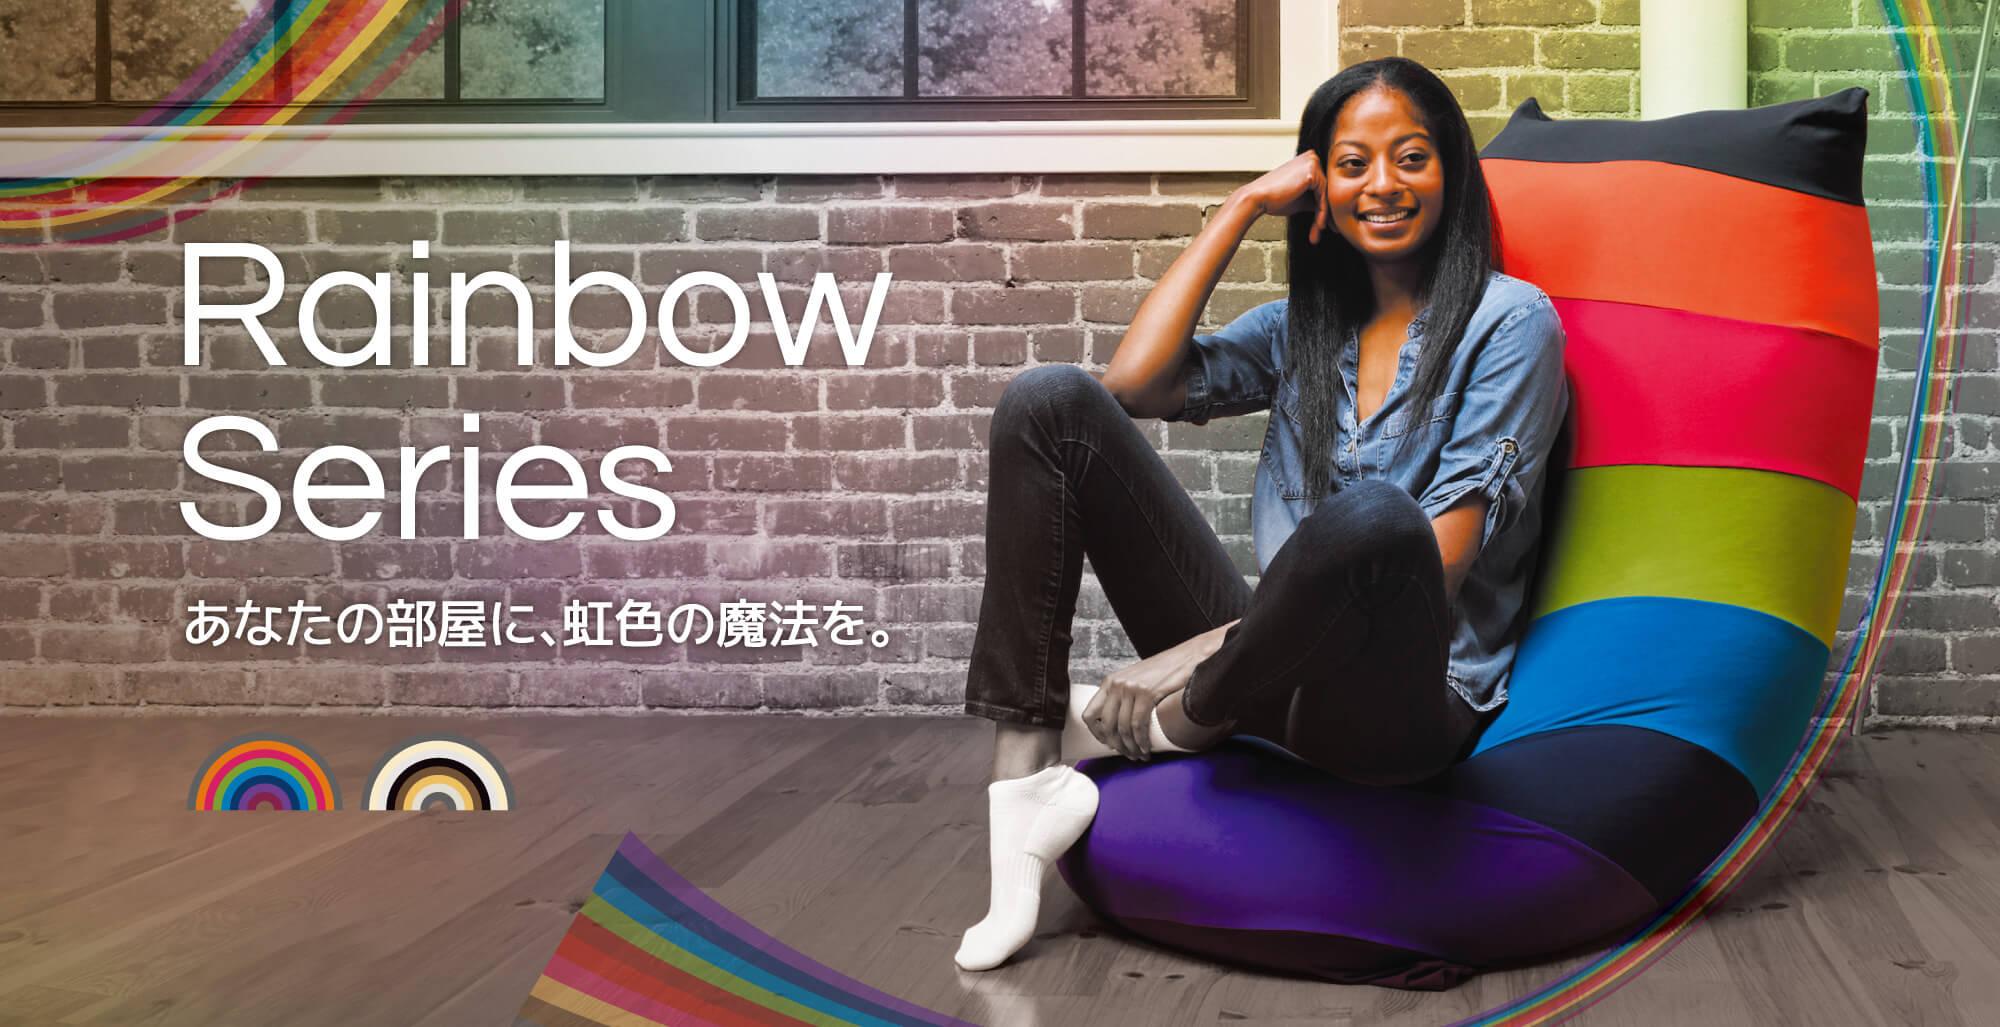 Rainbow Series | レインボーシリーズ